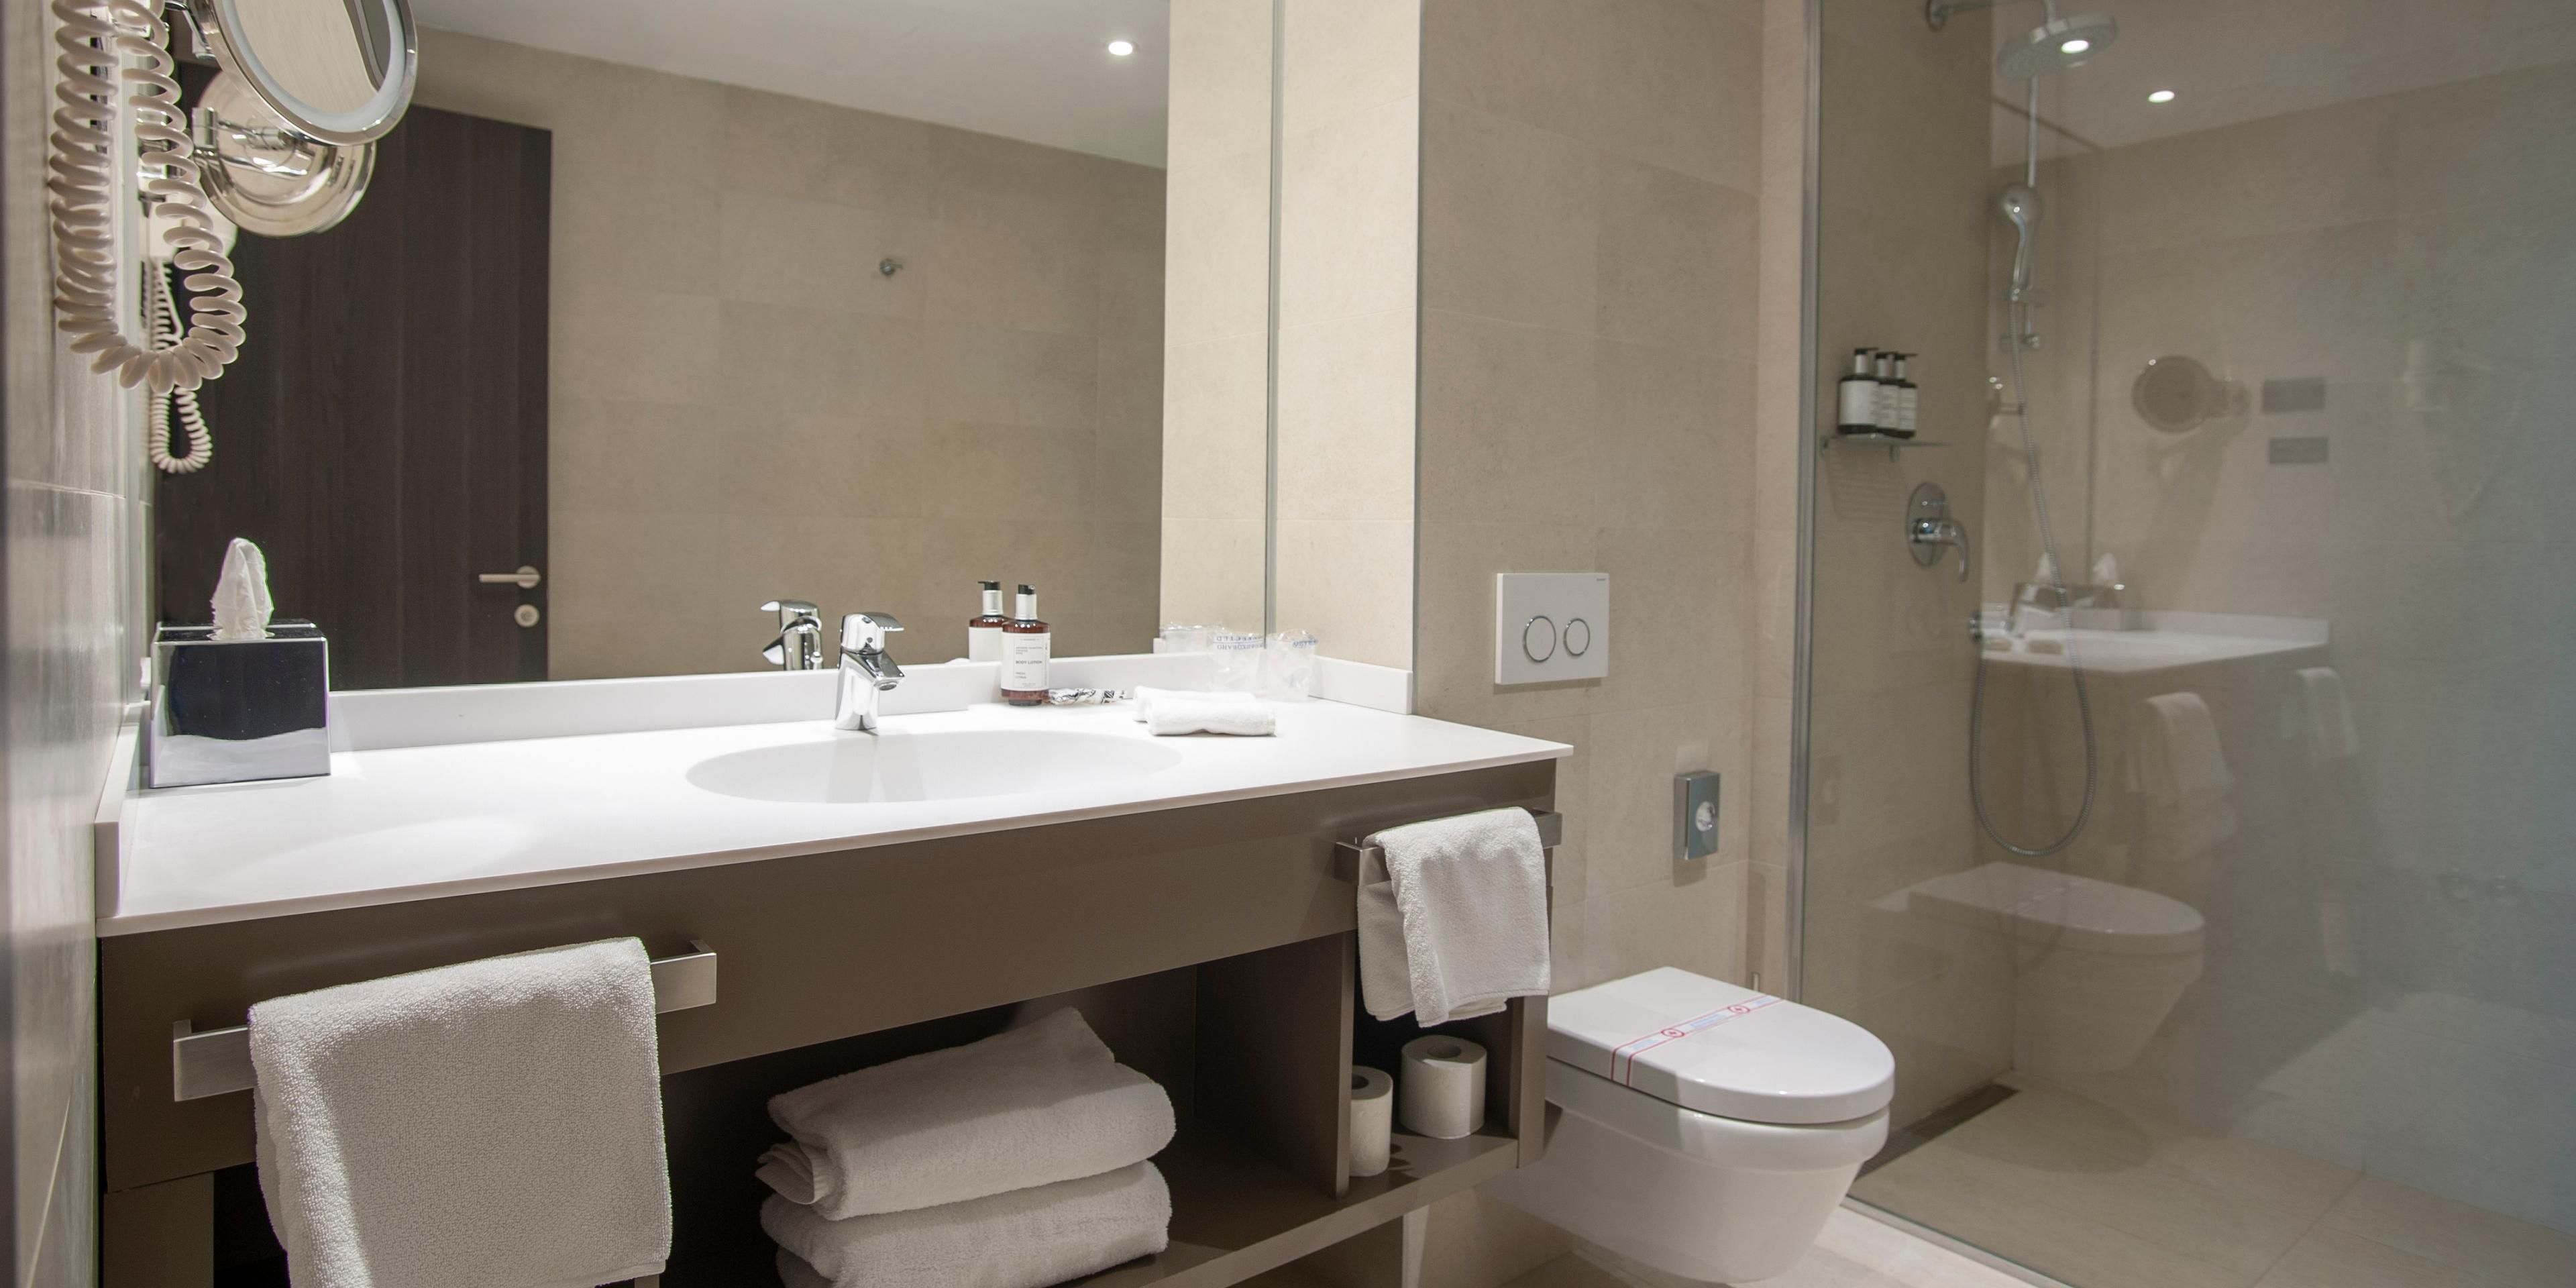 Toilet Suite Living room